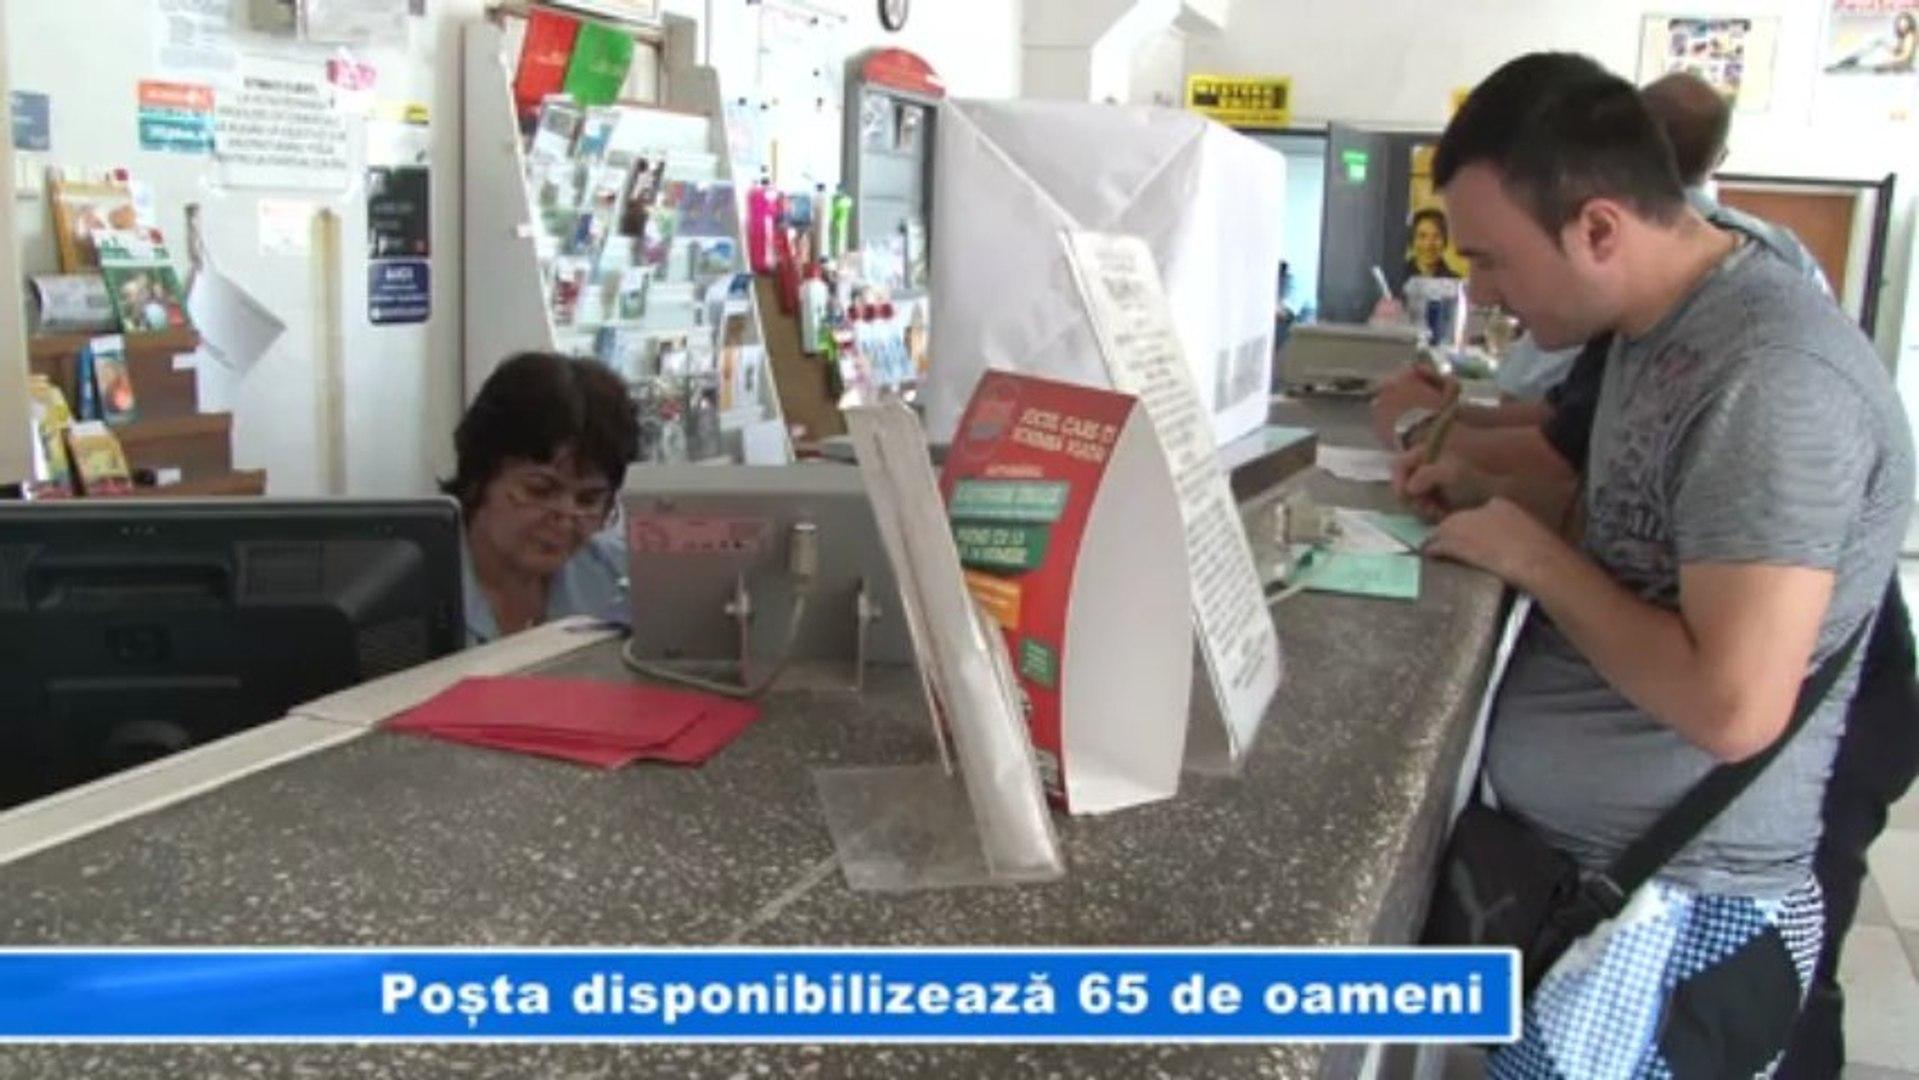 POSTA DISPONIBILIZEAZA 65 DE OAMENI